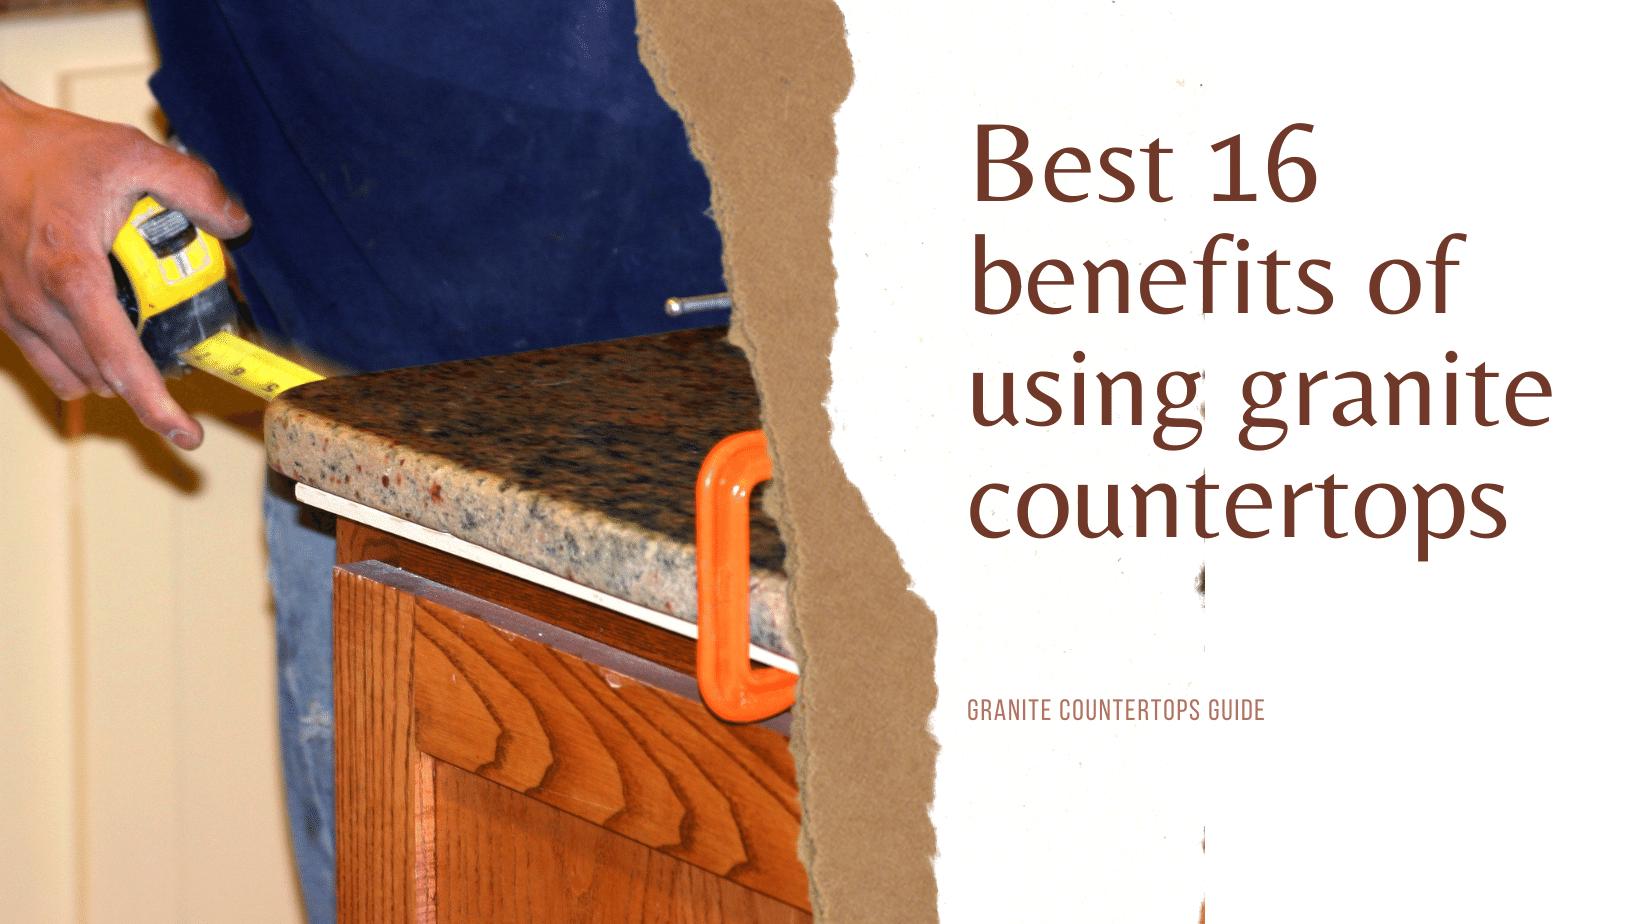 Best 16 benefits of using granite countertops